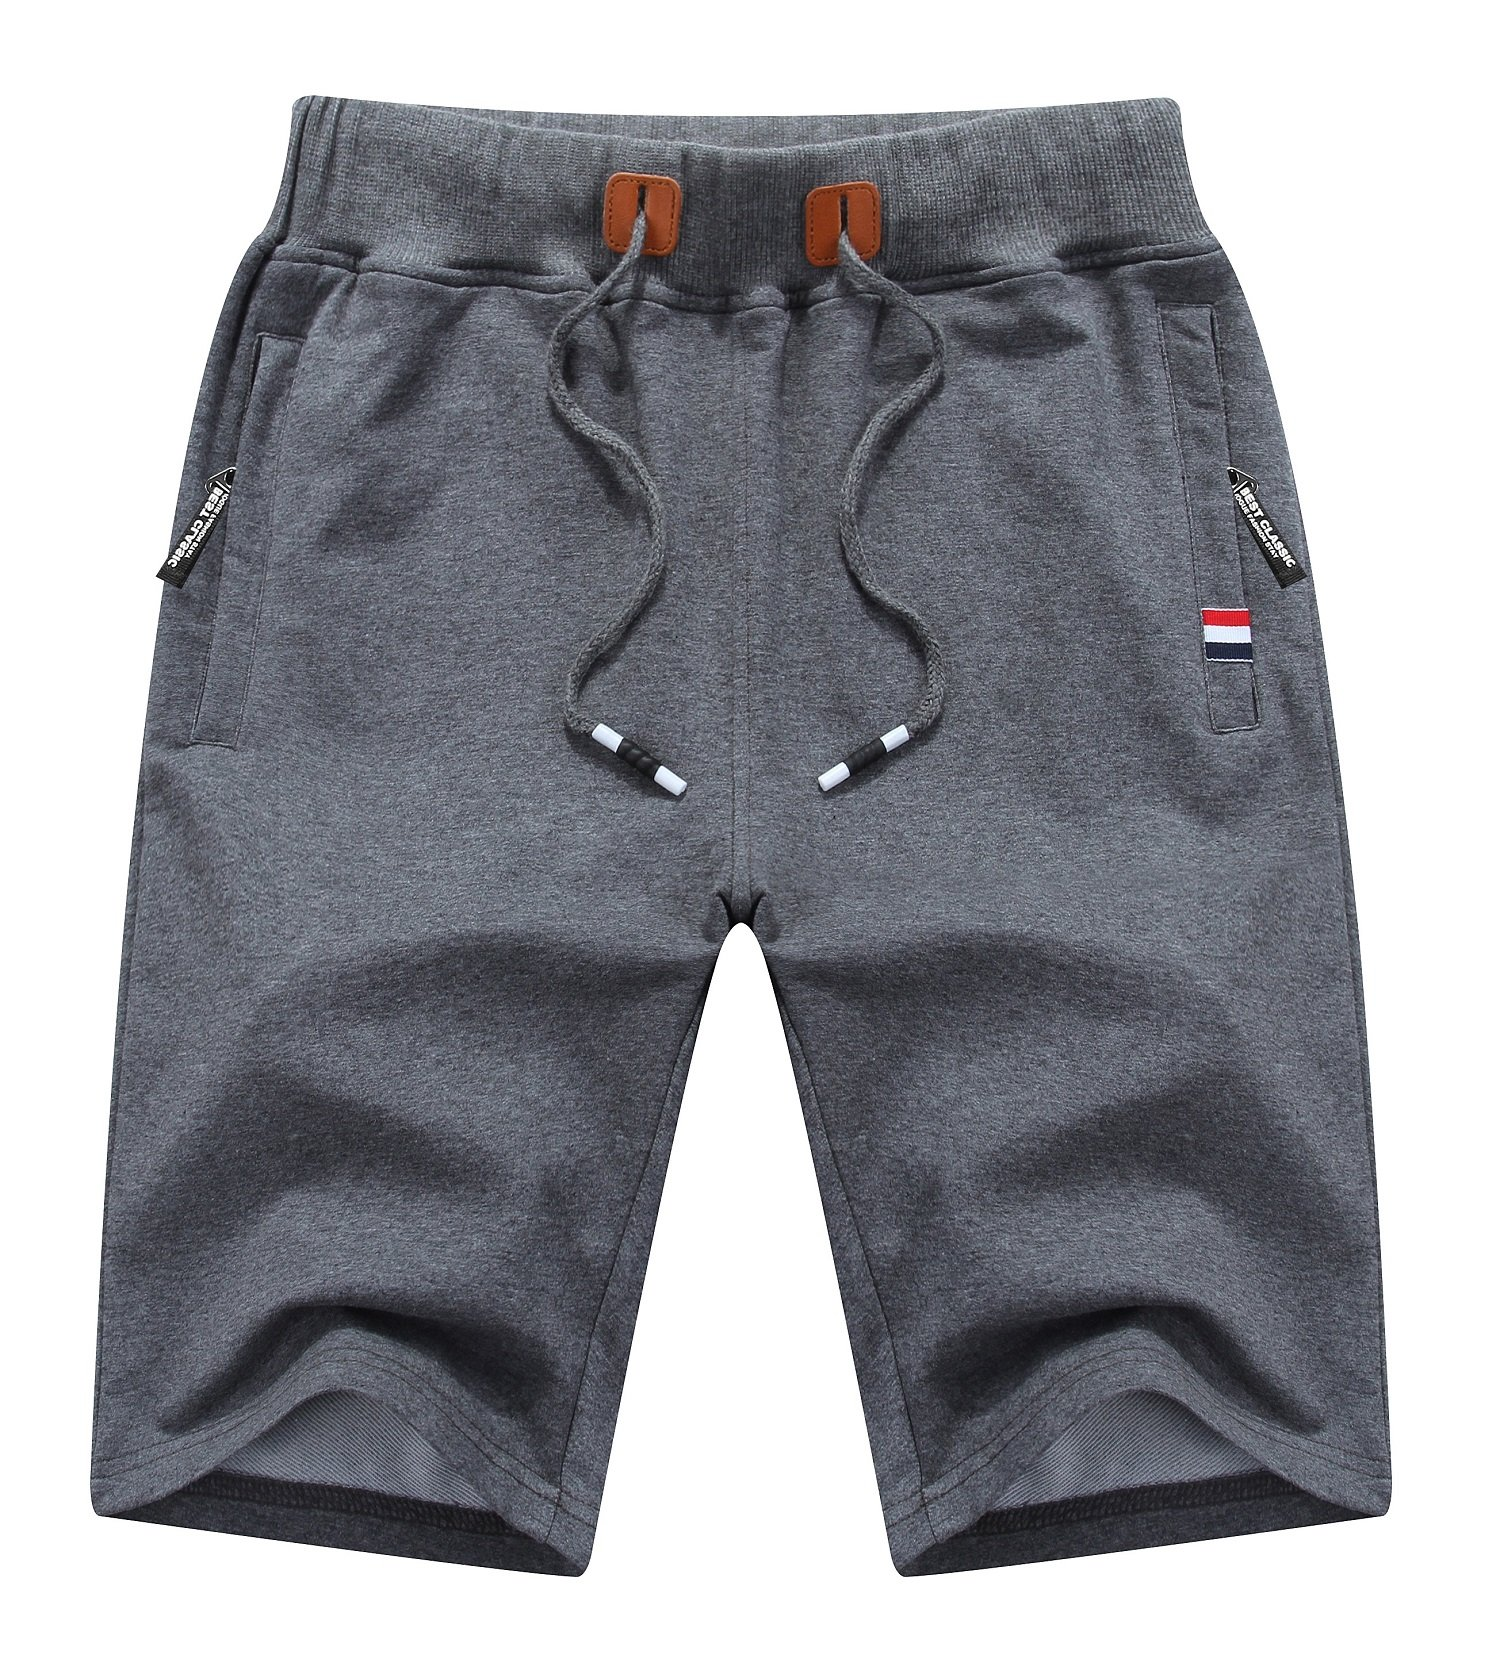 Higood Mens Casual Shorts 2018 Zipper Pockets and Slim-Fit Shorts (D-Gray, US (34-35))